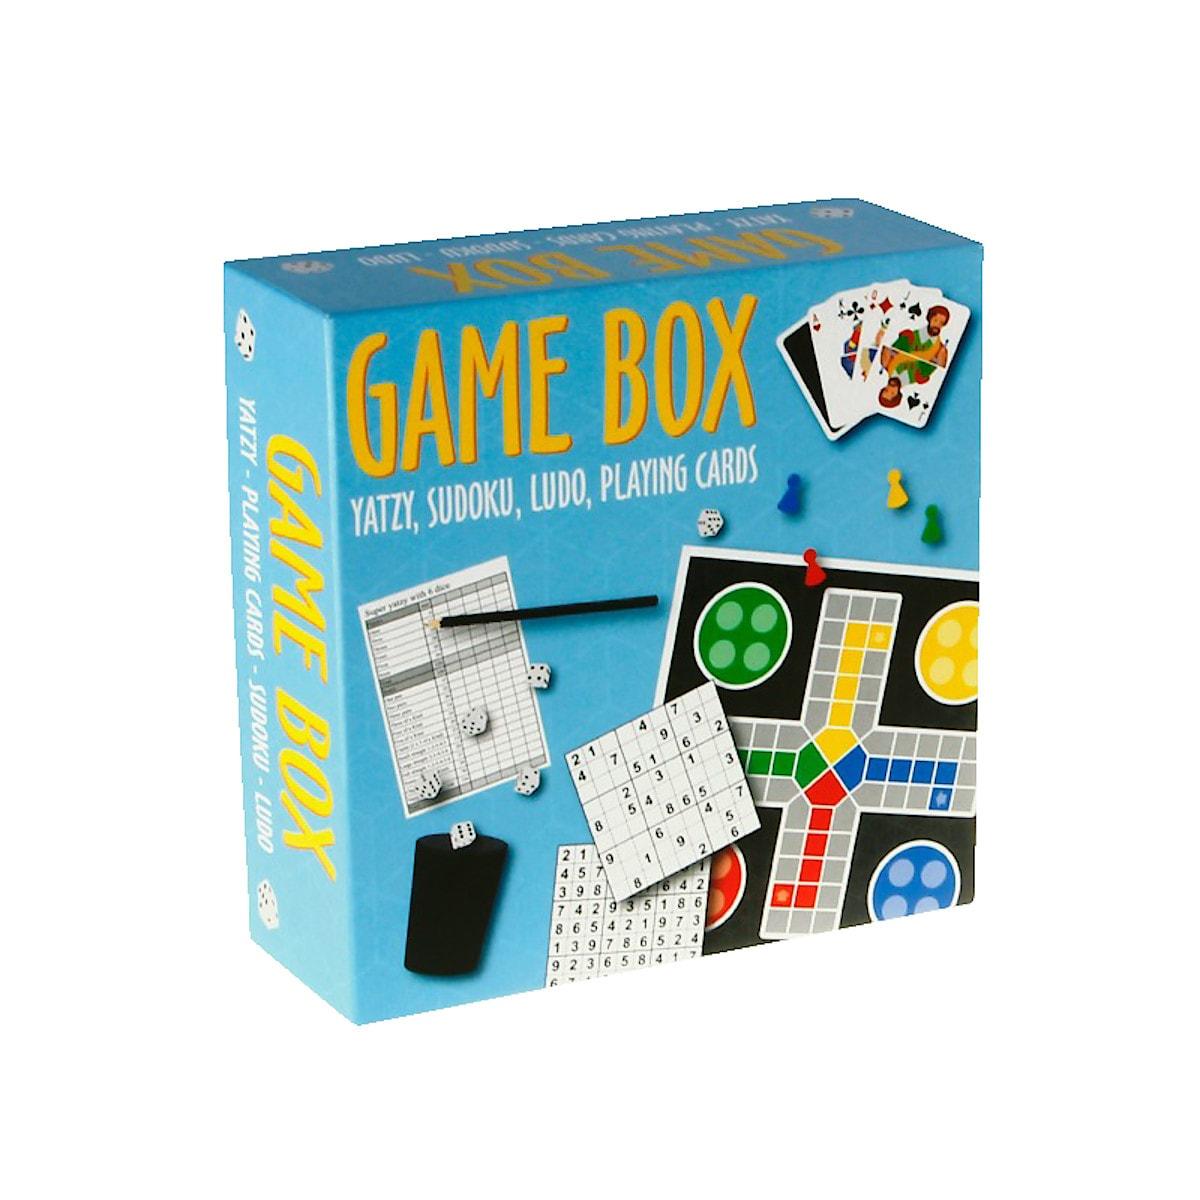 GAME BOX KLASSISKA SPEL